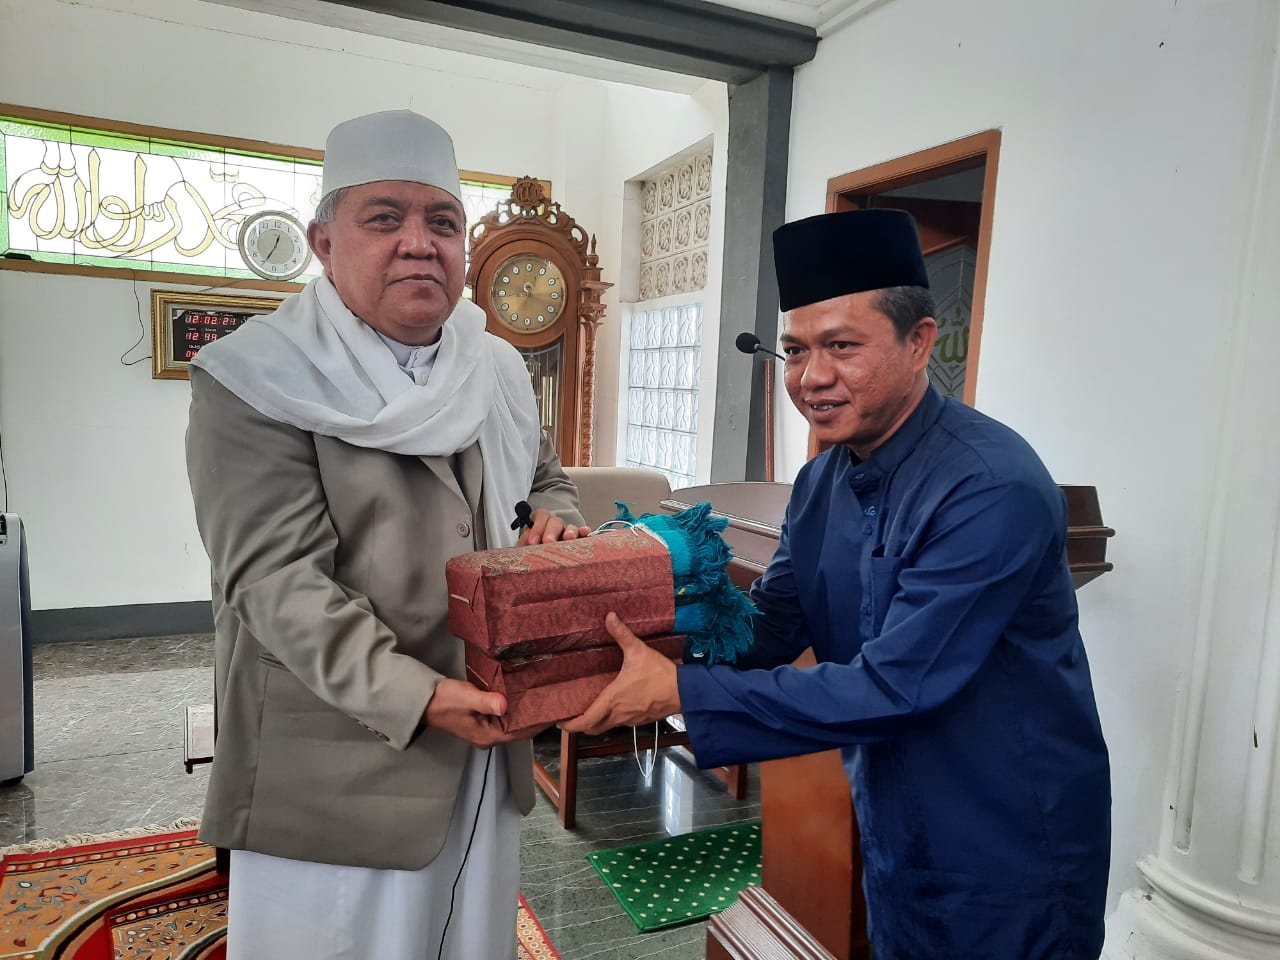 Bupati Bandung terpilih HM Dadang Supriatna menyerahkan cindera mata kepada Pimpinan Ponpes Darul Ma'arif KH Sofyan Yahya, di Desa Rahayu, Kec Margaasih, Kab Bandung, Jumat (12/2/2021).